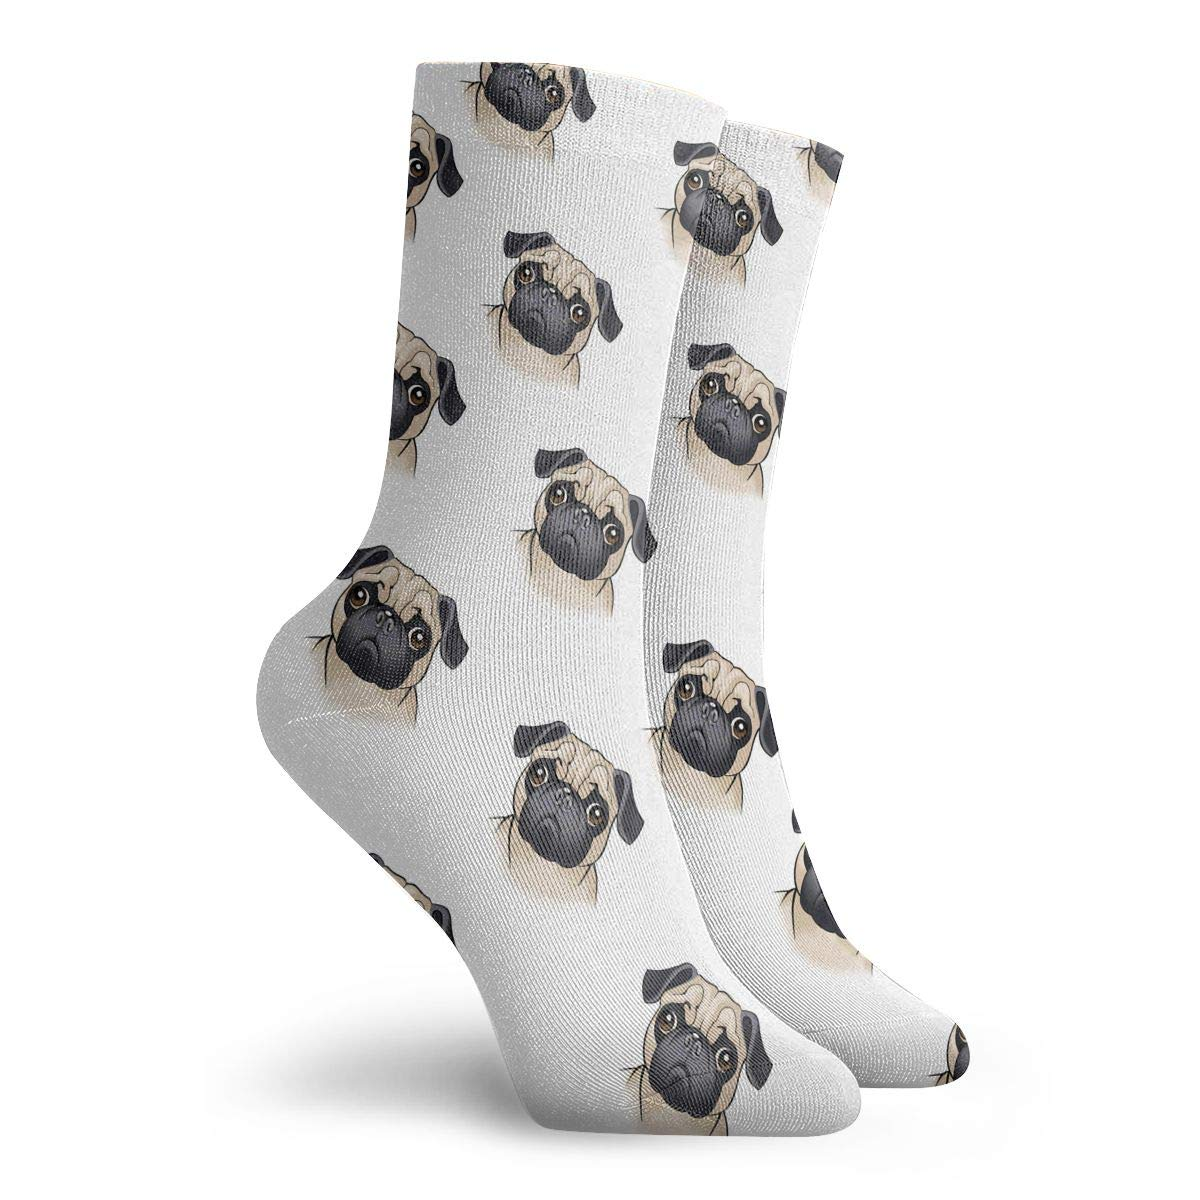 Cute Pug Pattern Unisex Funny Casual Crew Socks Athletic Socks For Boys Girls Kids Teenagers